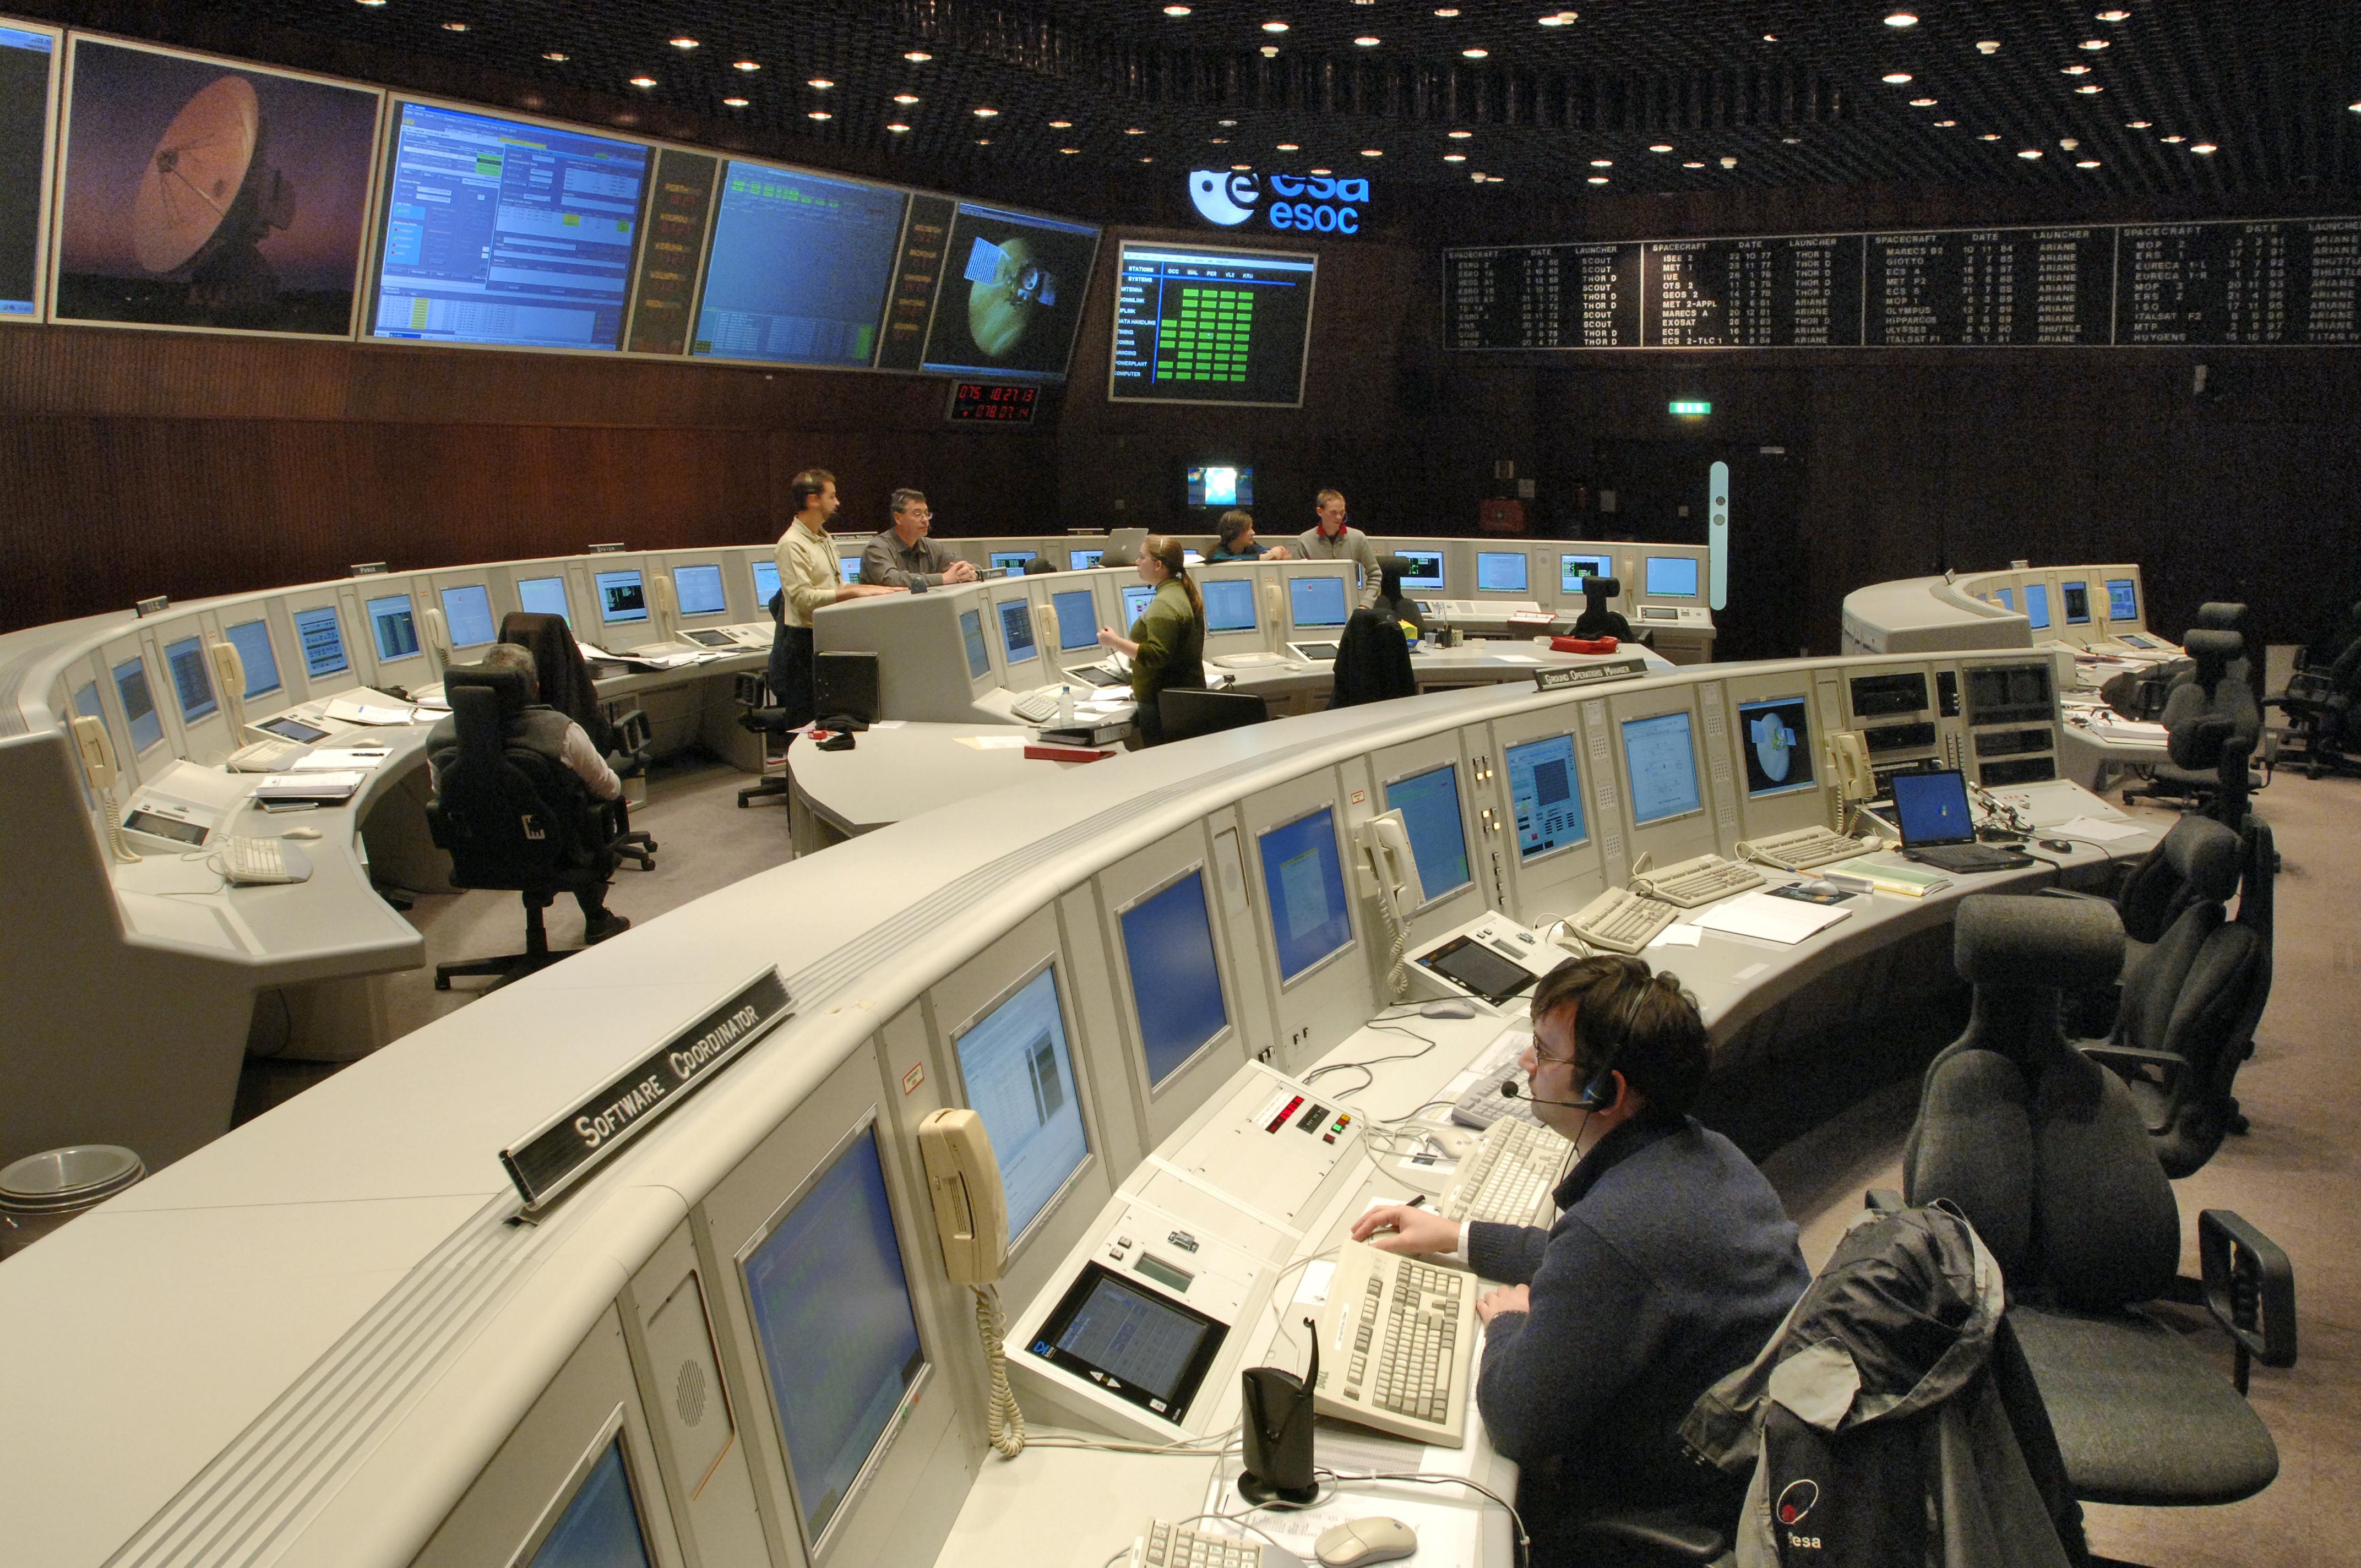 Space in Images - 2006 - 04 - Venus Express flight control team